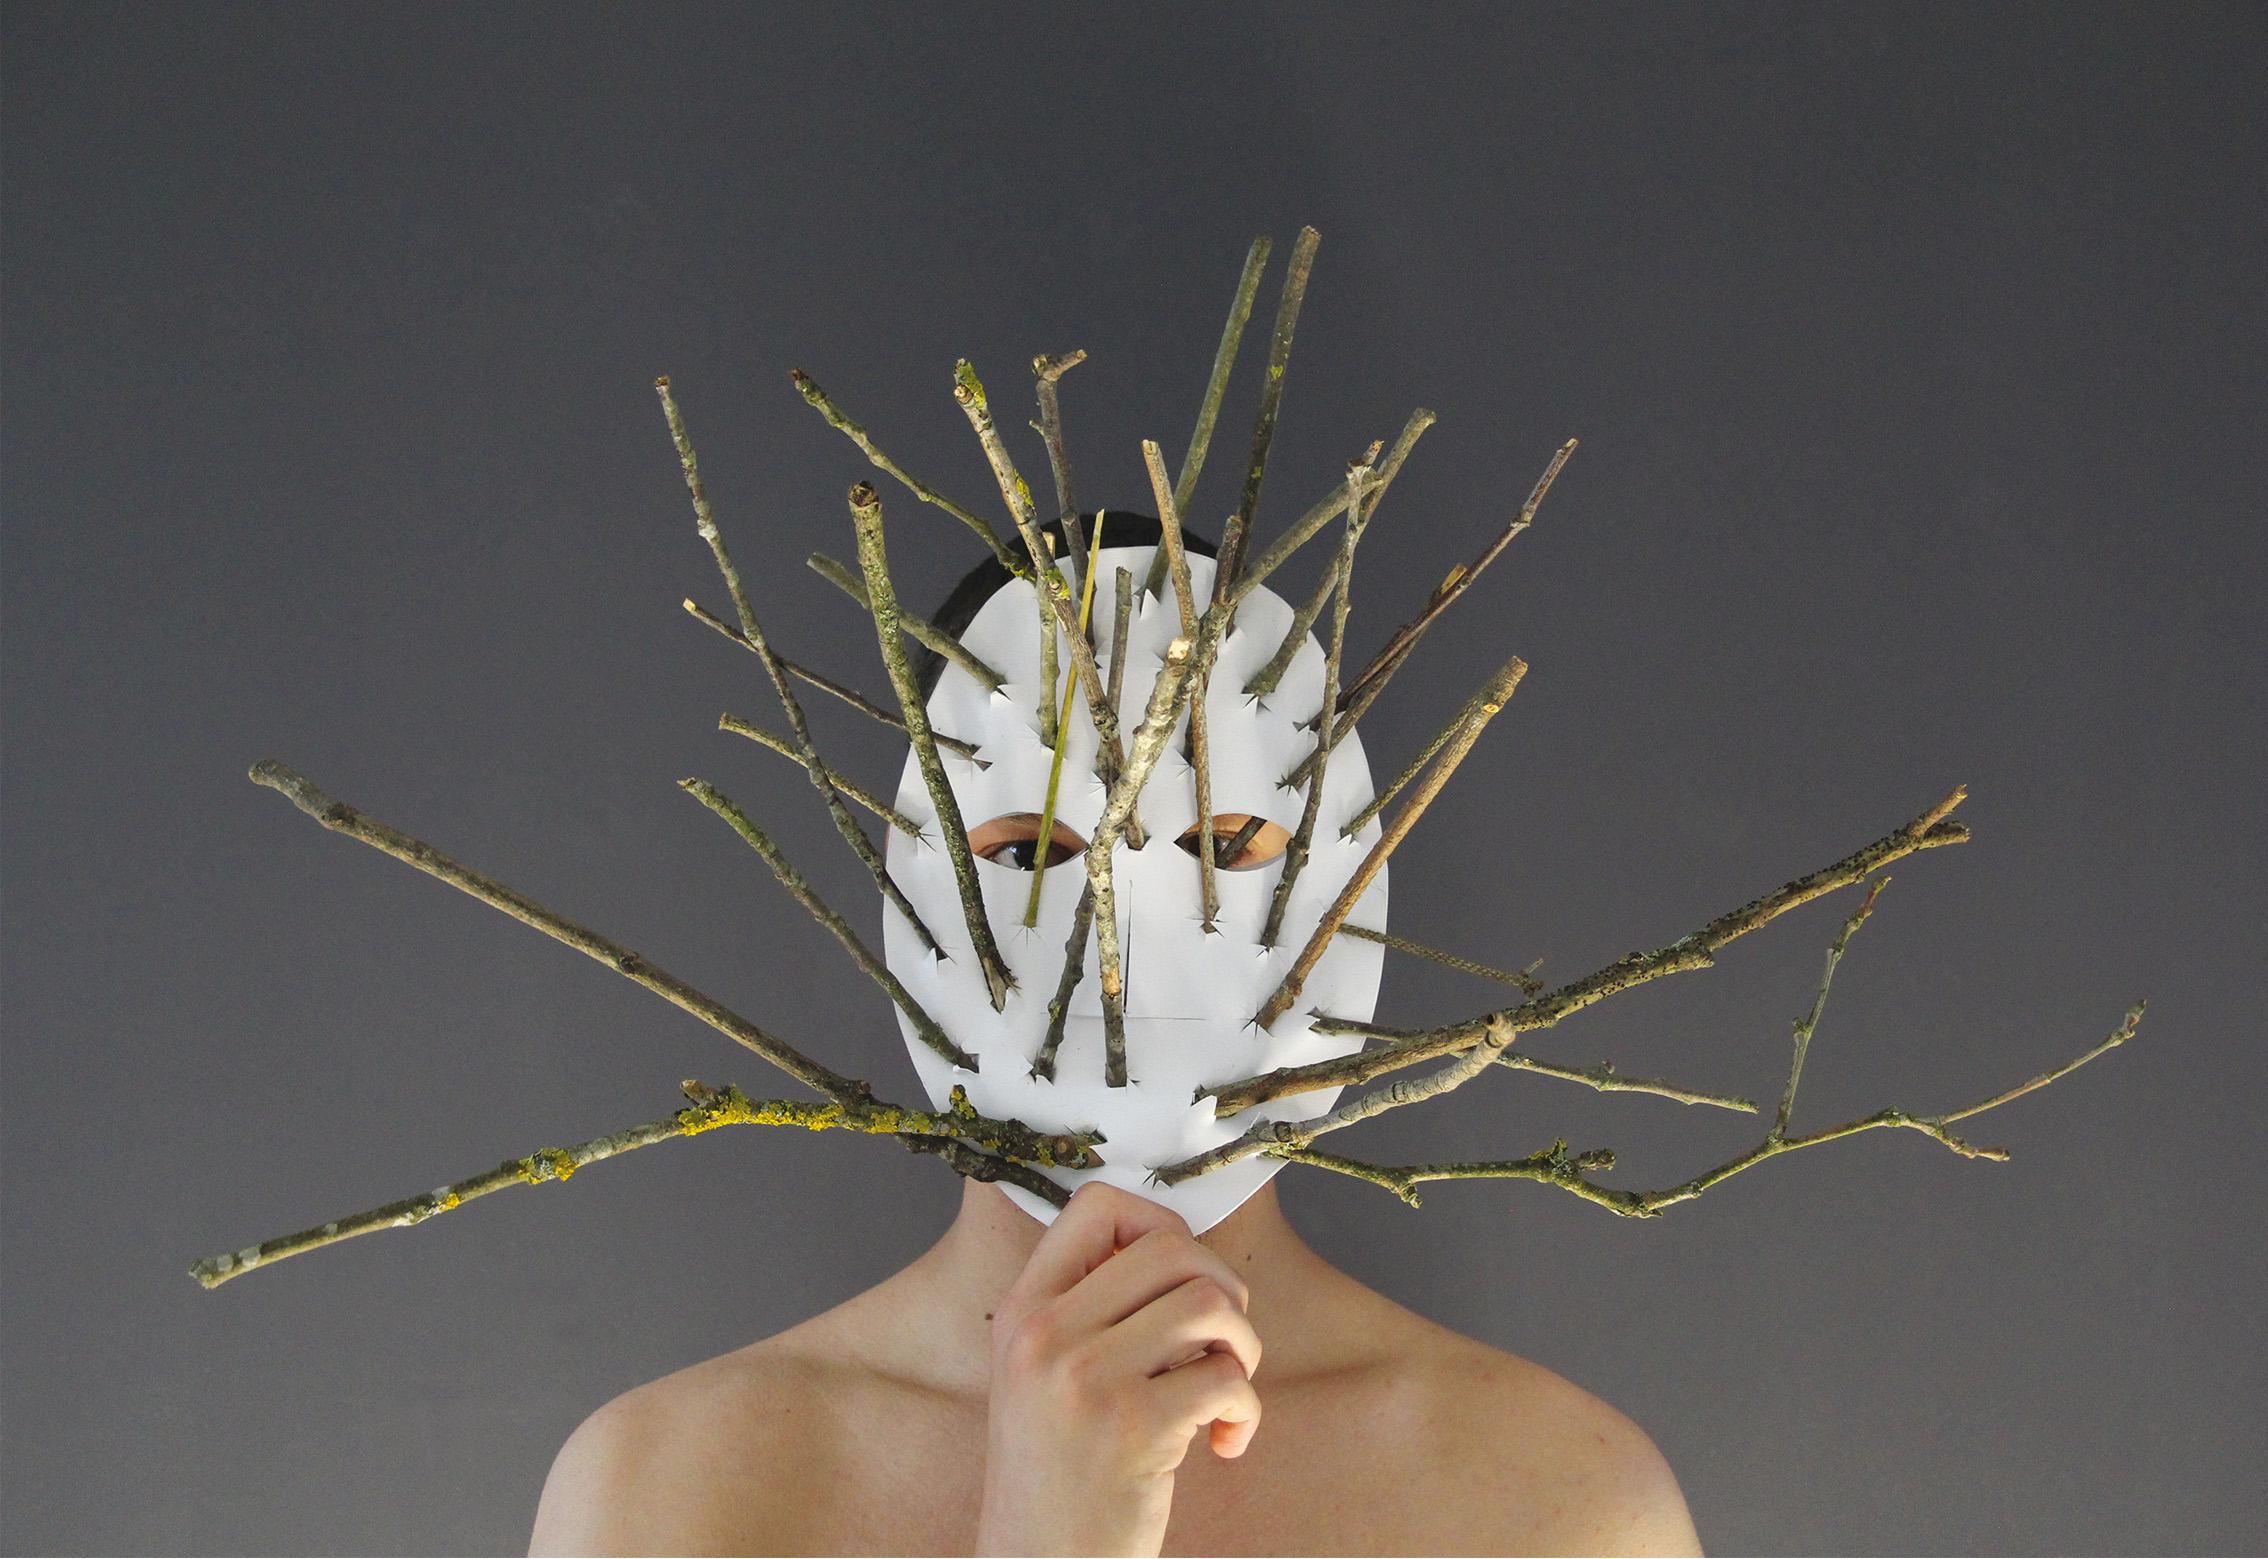 ESDMAA-DSAADp-Panoplie-Lucille_Lamirand-01-Recherches_masques.jpg